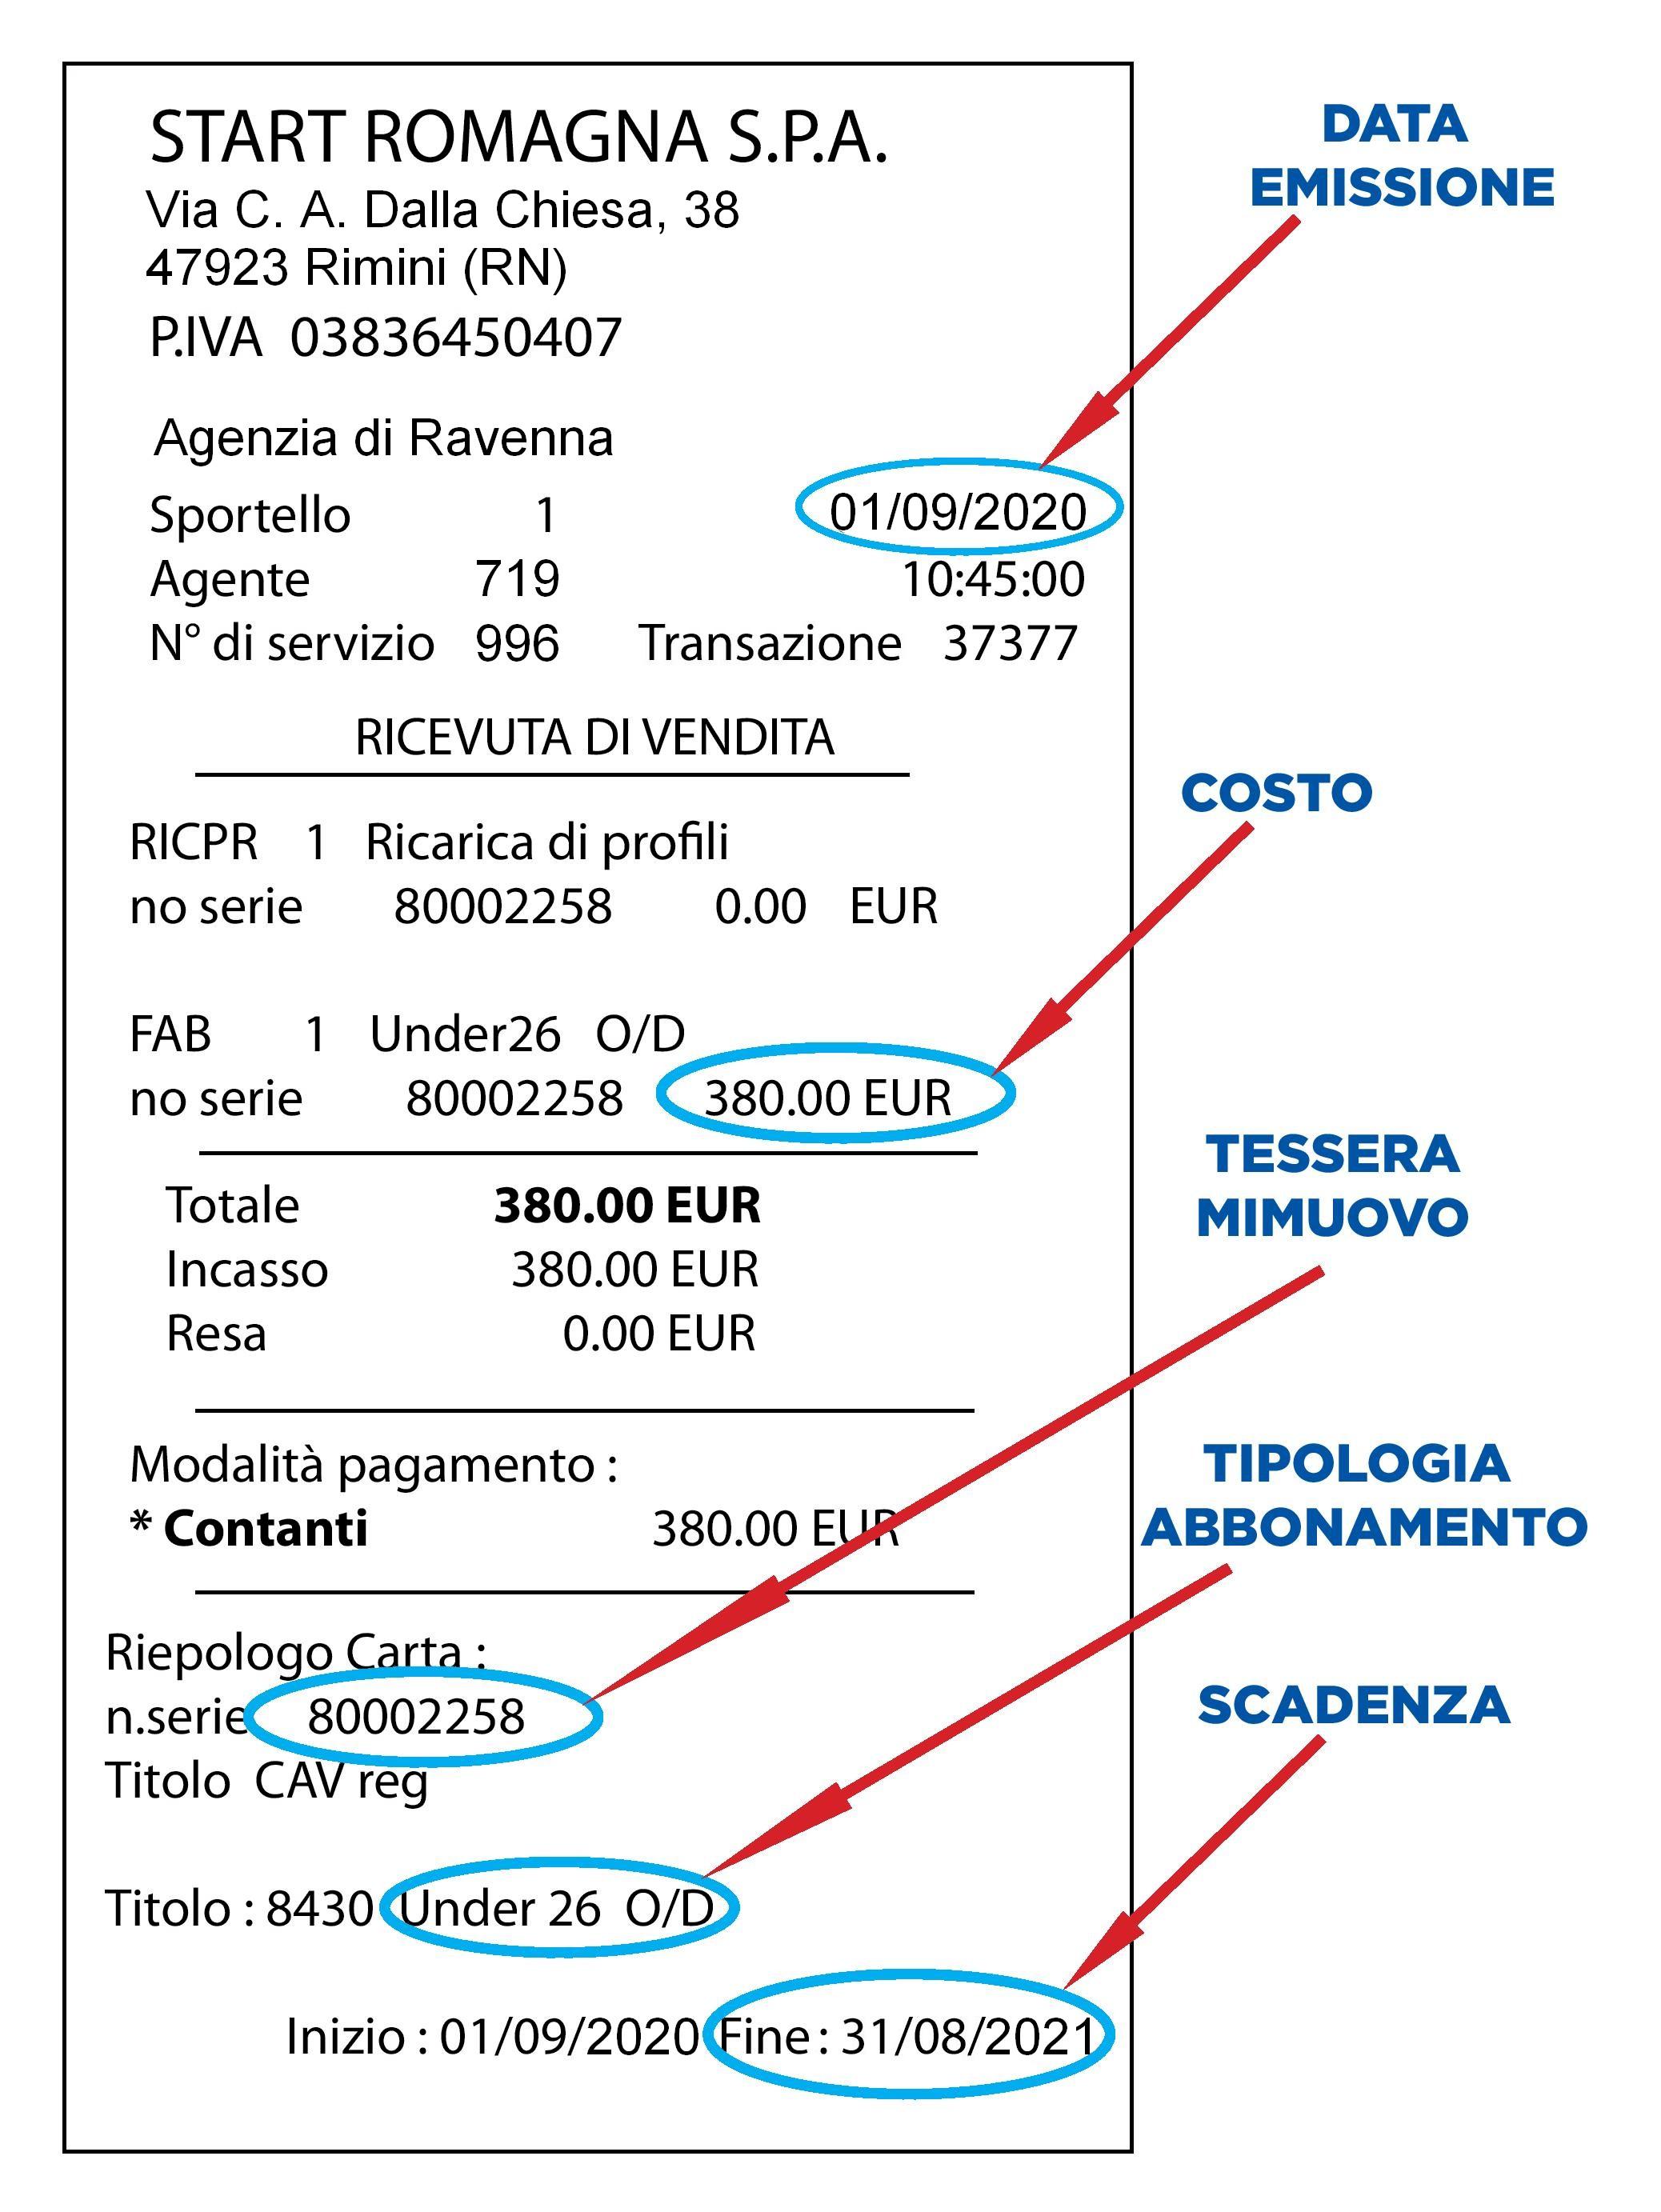 Ricevuta_abbonamento.jpg